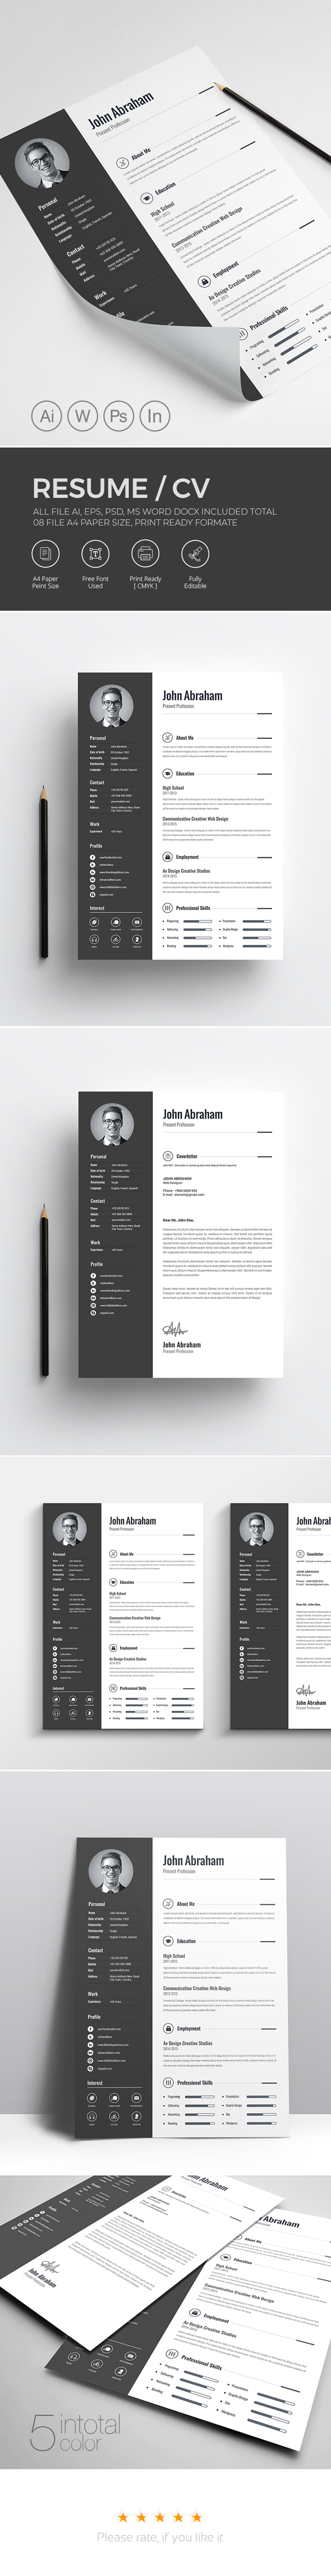 a4 resume bebas clean cv cover letter creative CV Creative Resume curriculum Vitae CV